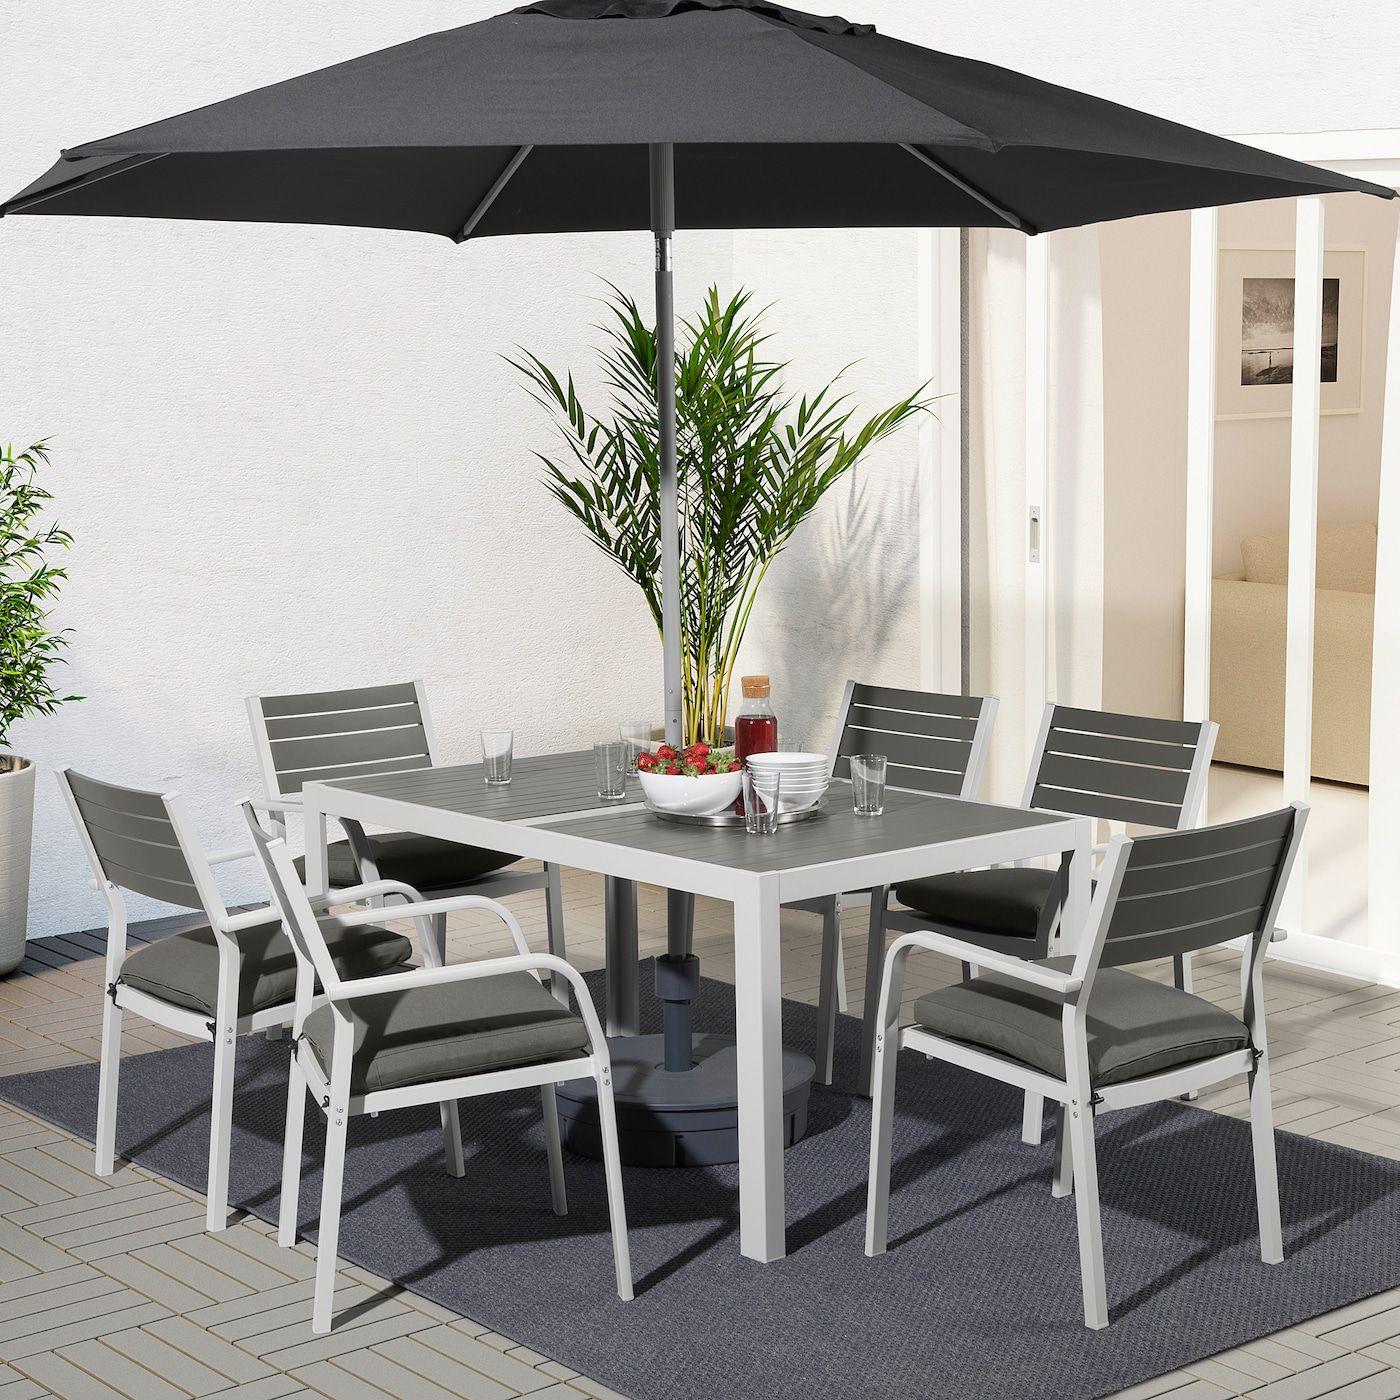 SJÄLLAND dark grey, Frösön/Duvholmen dark grey, Table+6